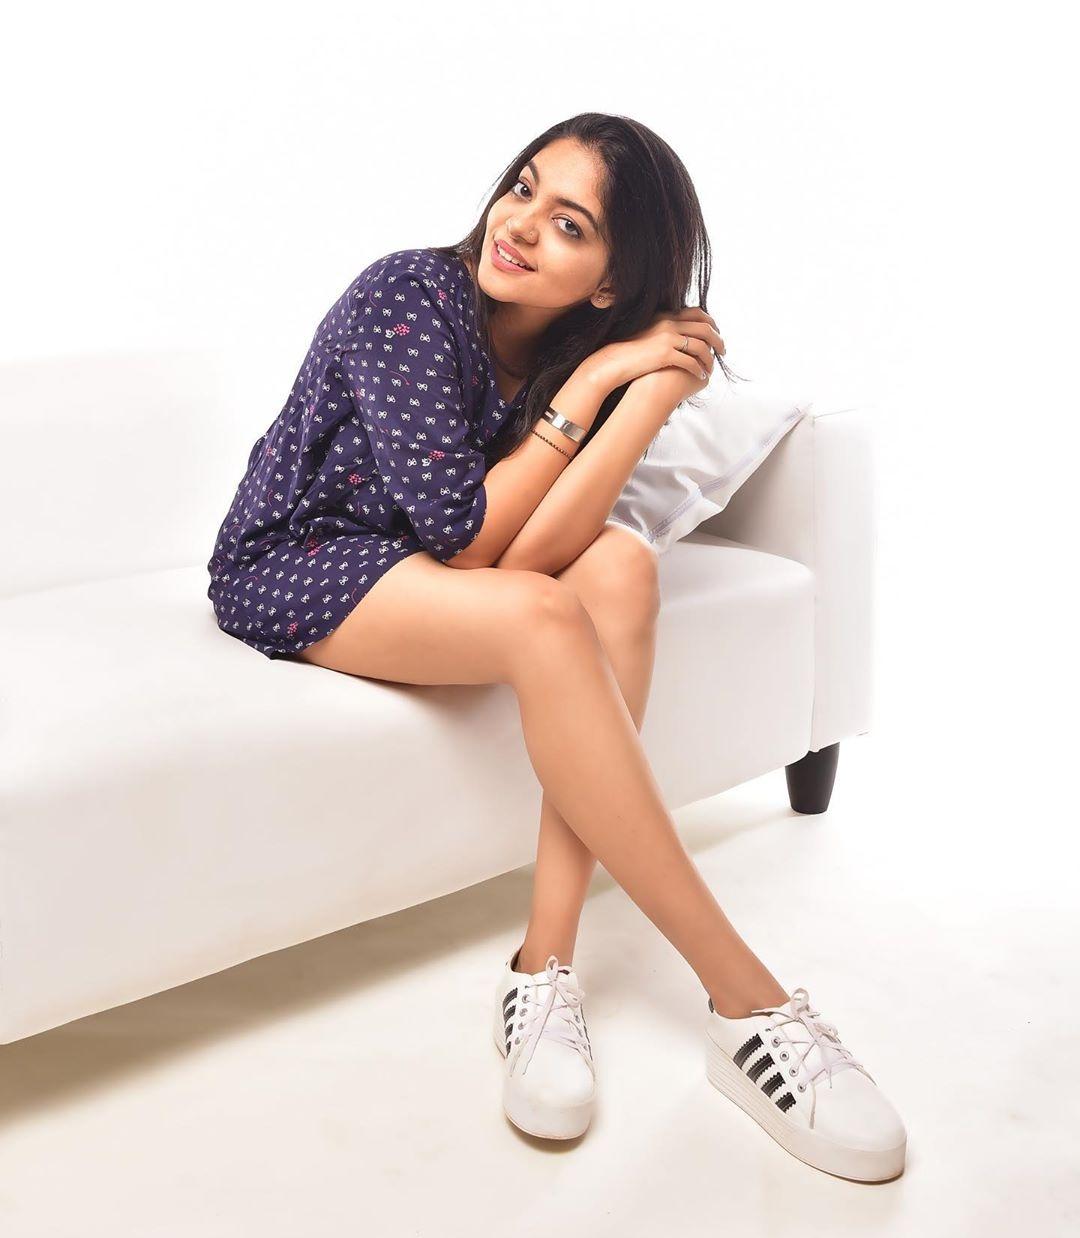 Ahaana krishna legs